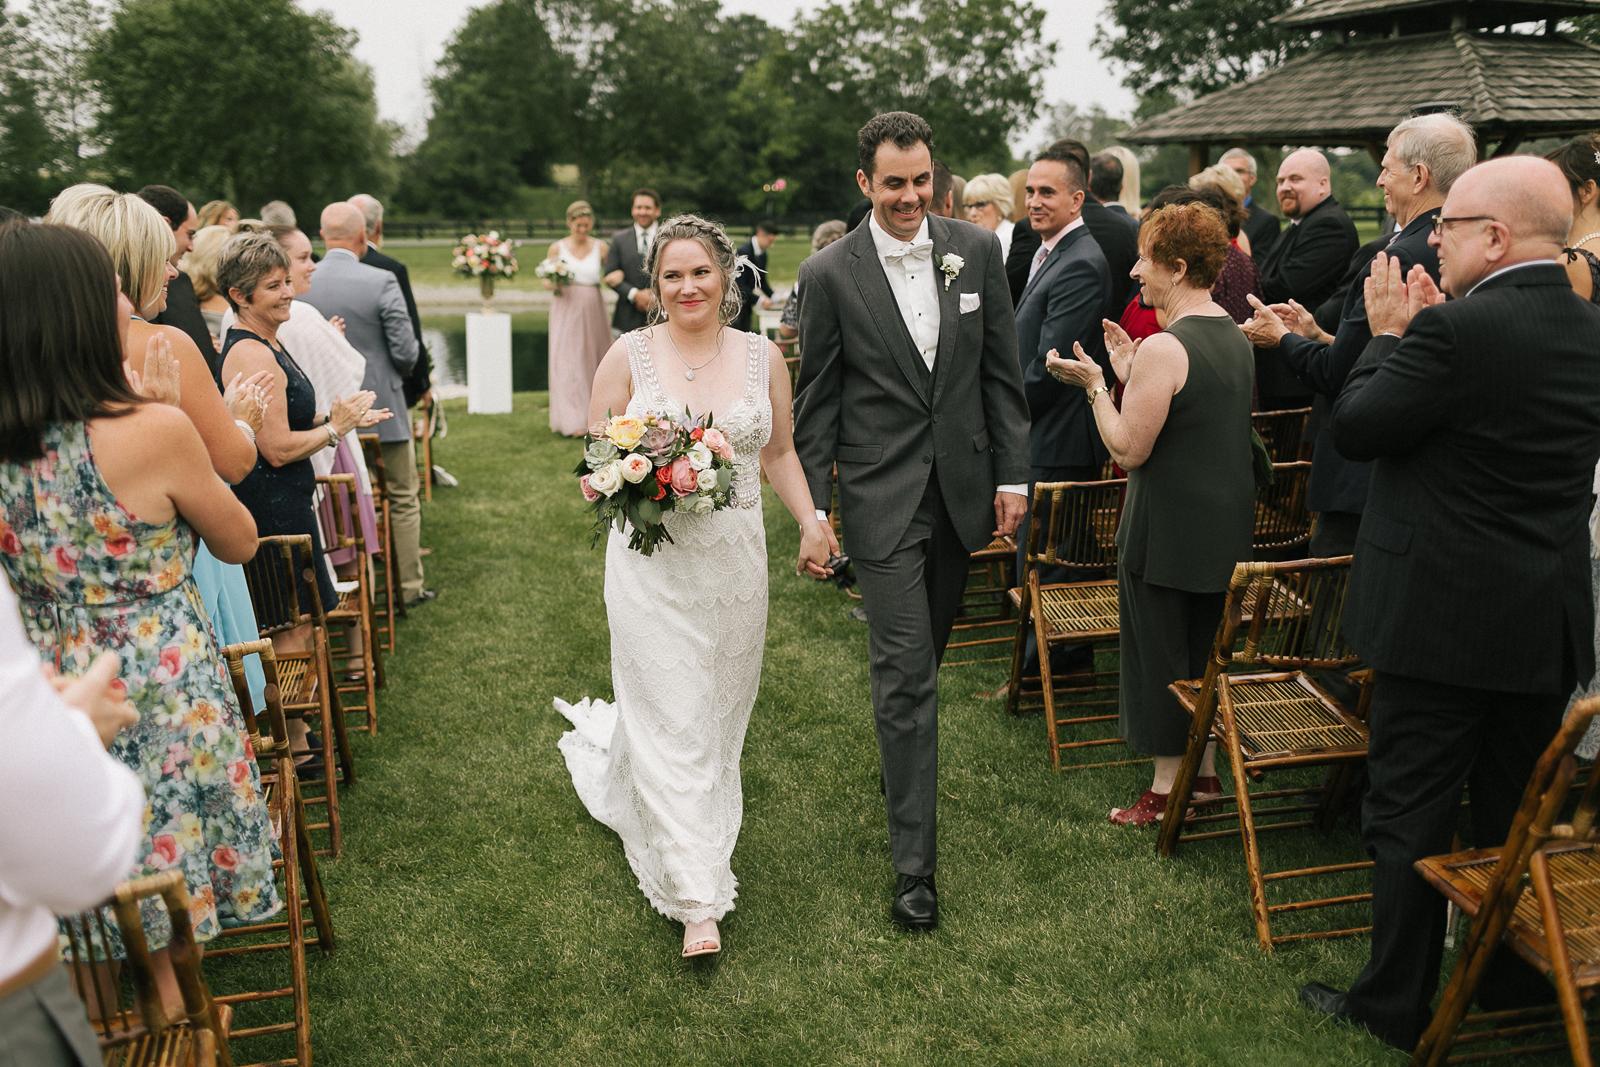 mike-and-jenni-wedding-284.jpg